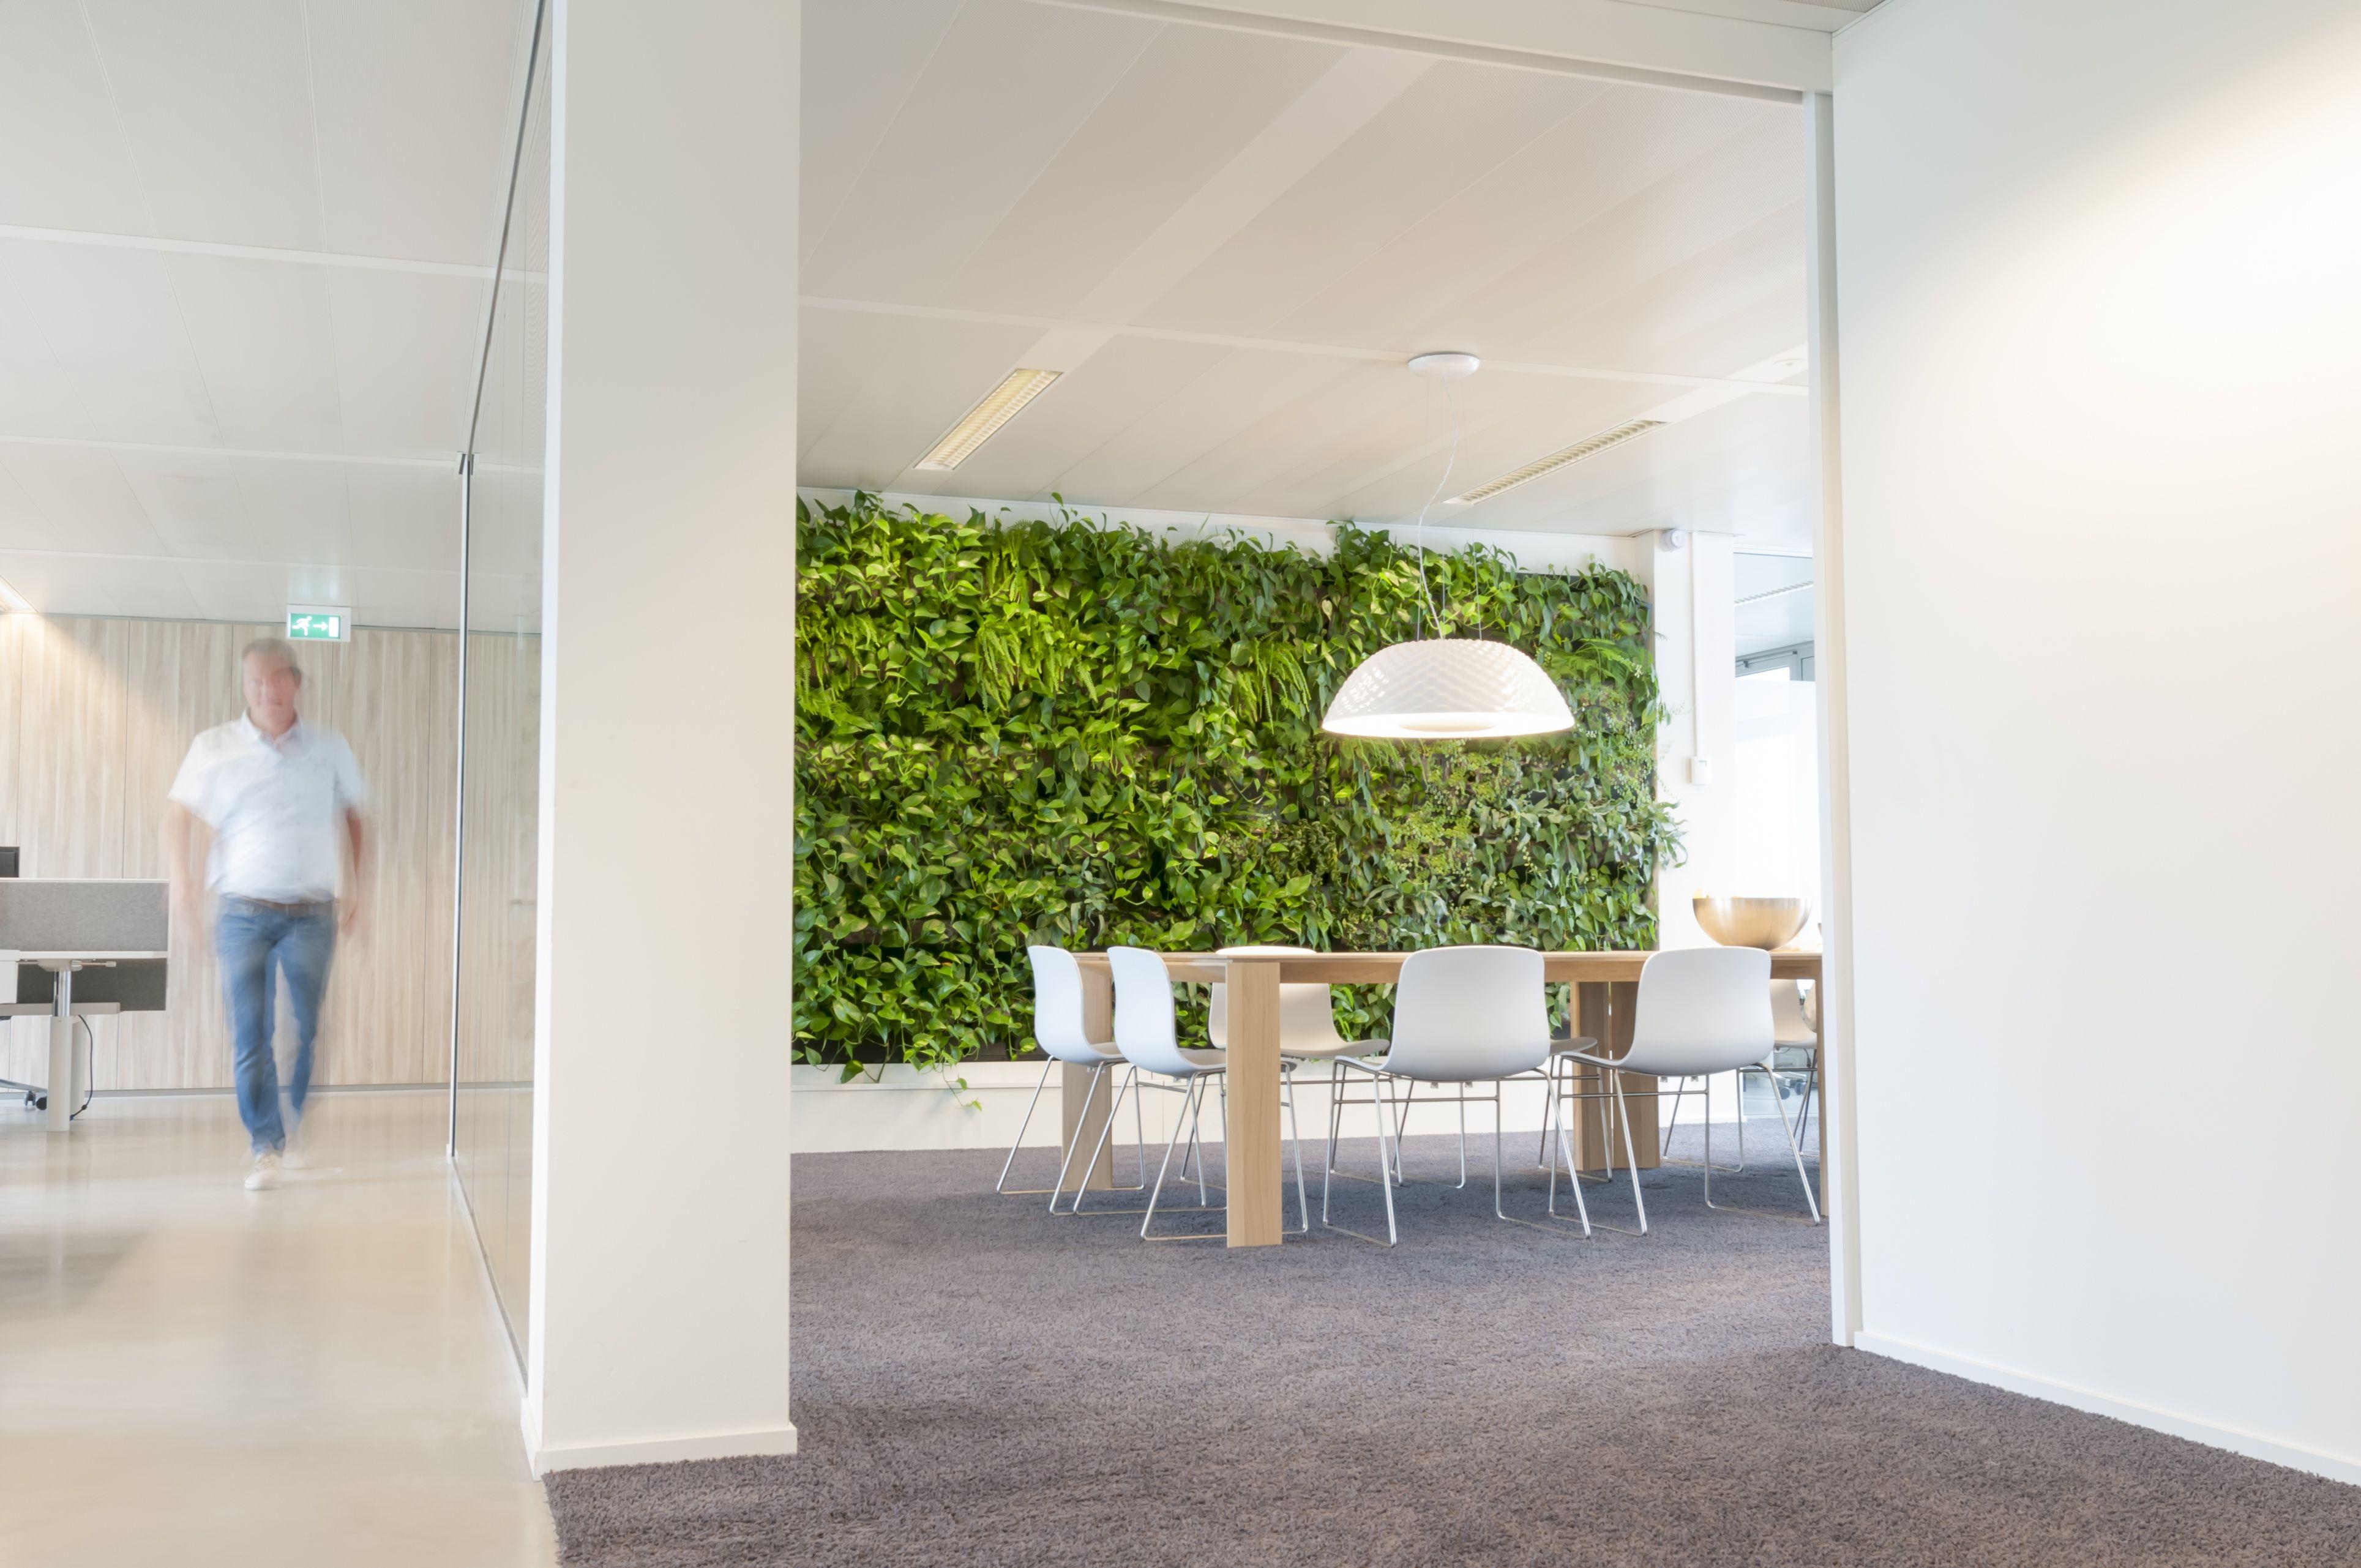 Urban Jungle Inspiratie : Groene wand verticaal groen plantenwand interieurbeplanting